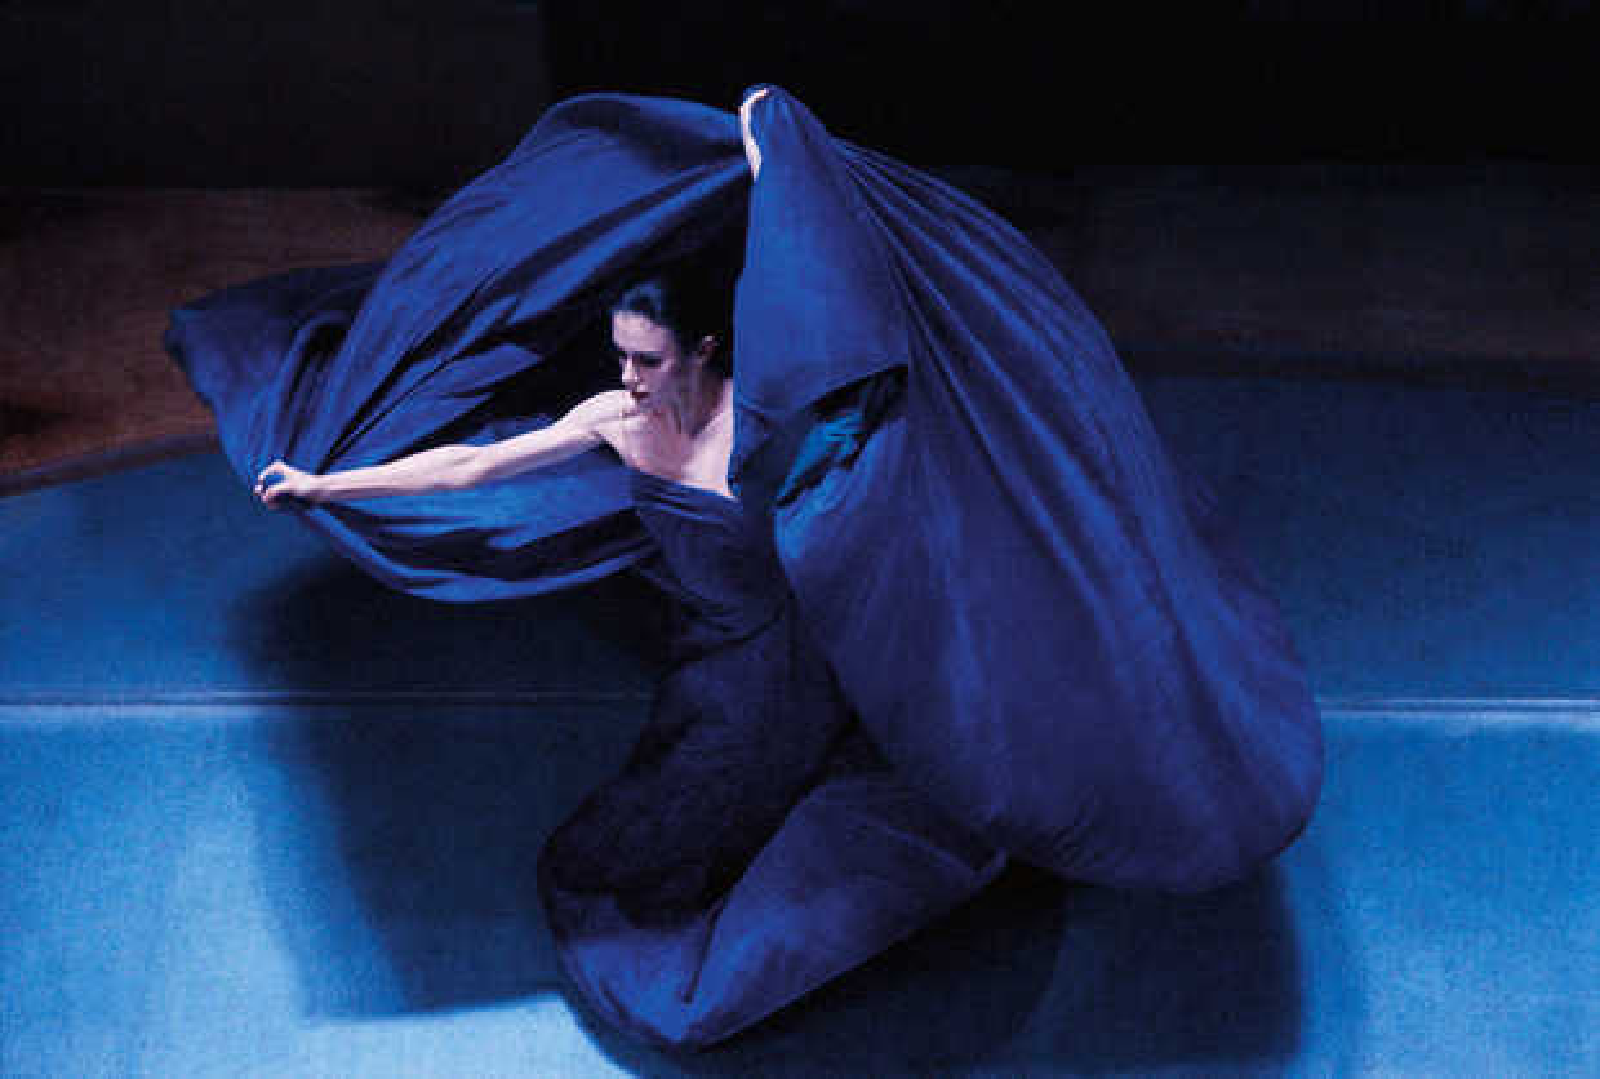 Blaues Tuch, Stuttgarter Ballett - Dieter Blum